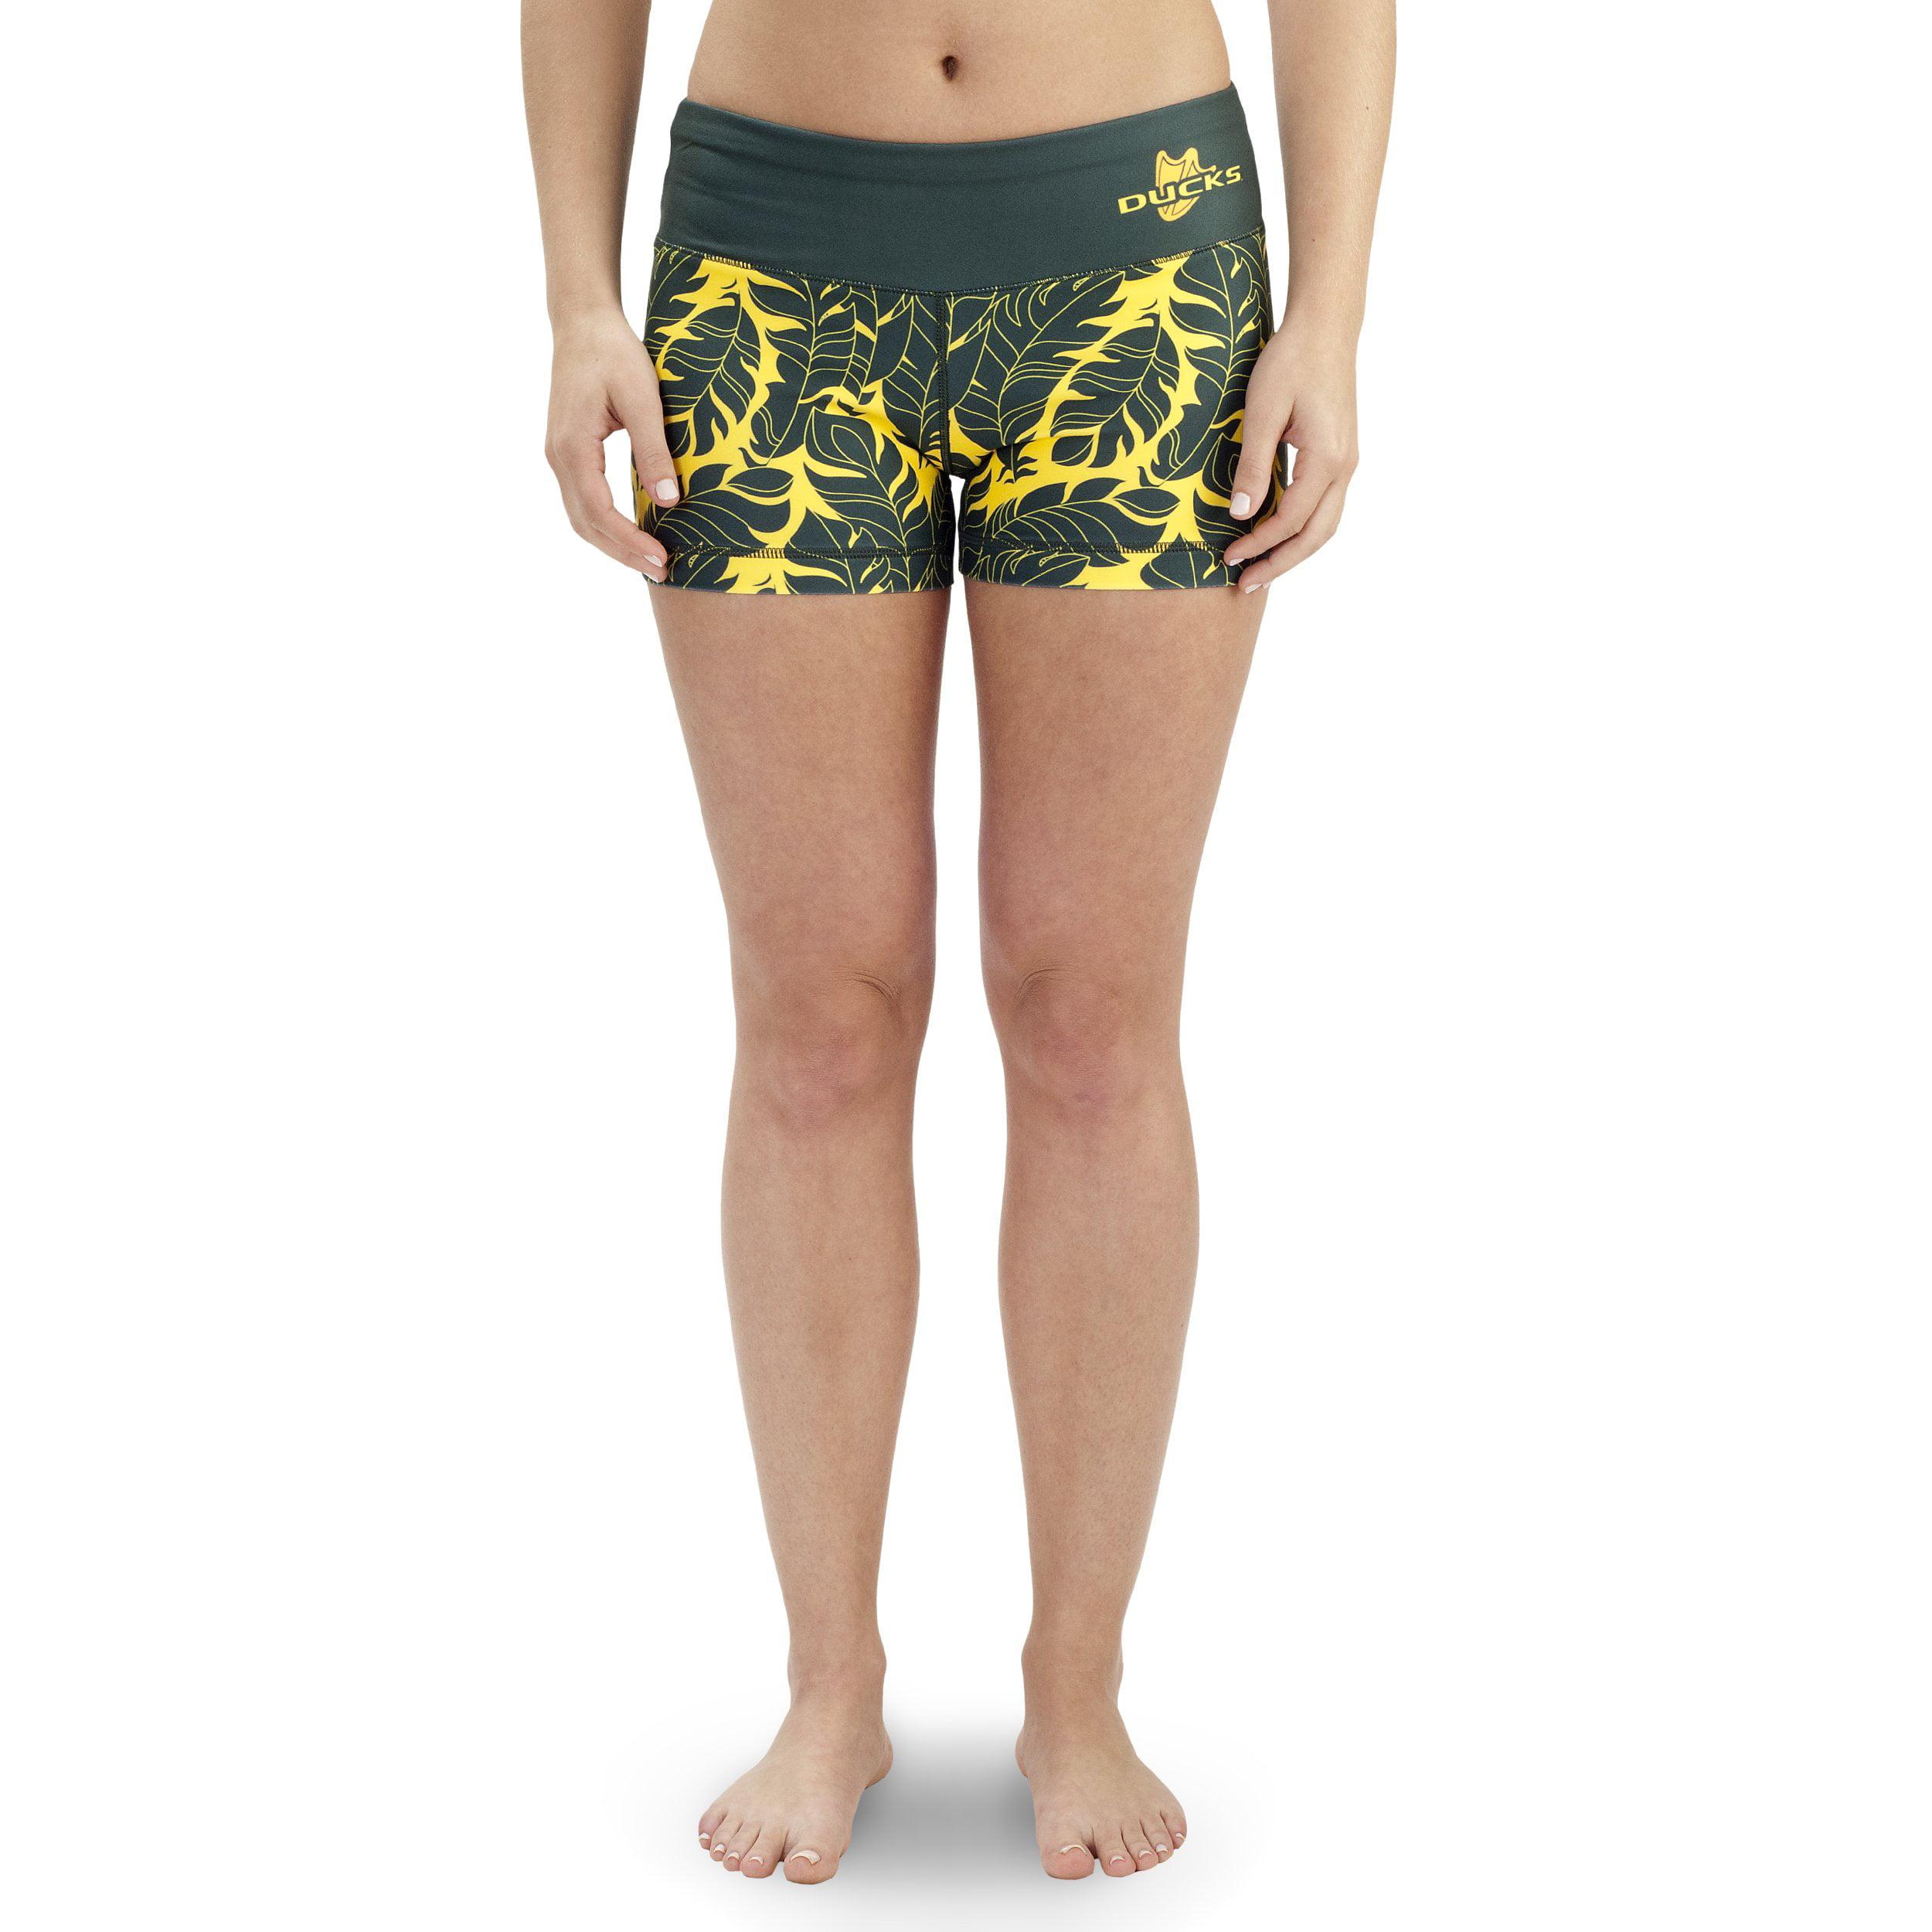 NCAA Women's Oregon Ducks Thematic Print Bootie Shorts, Green